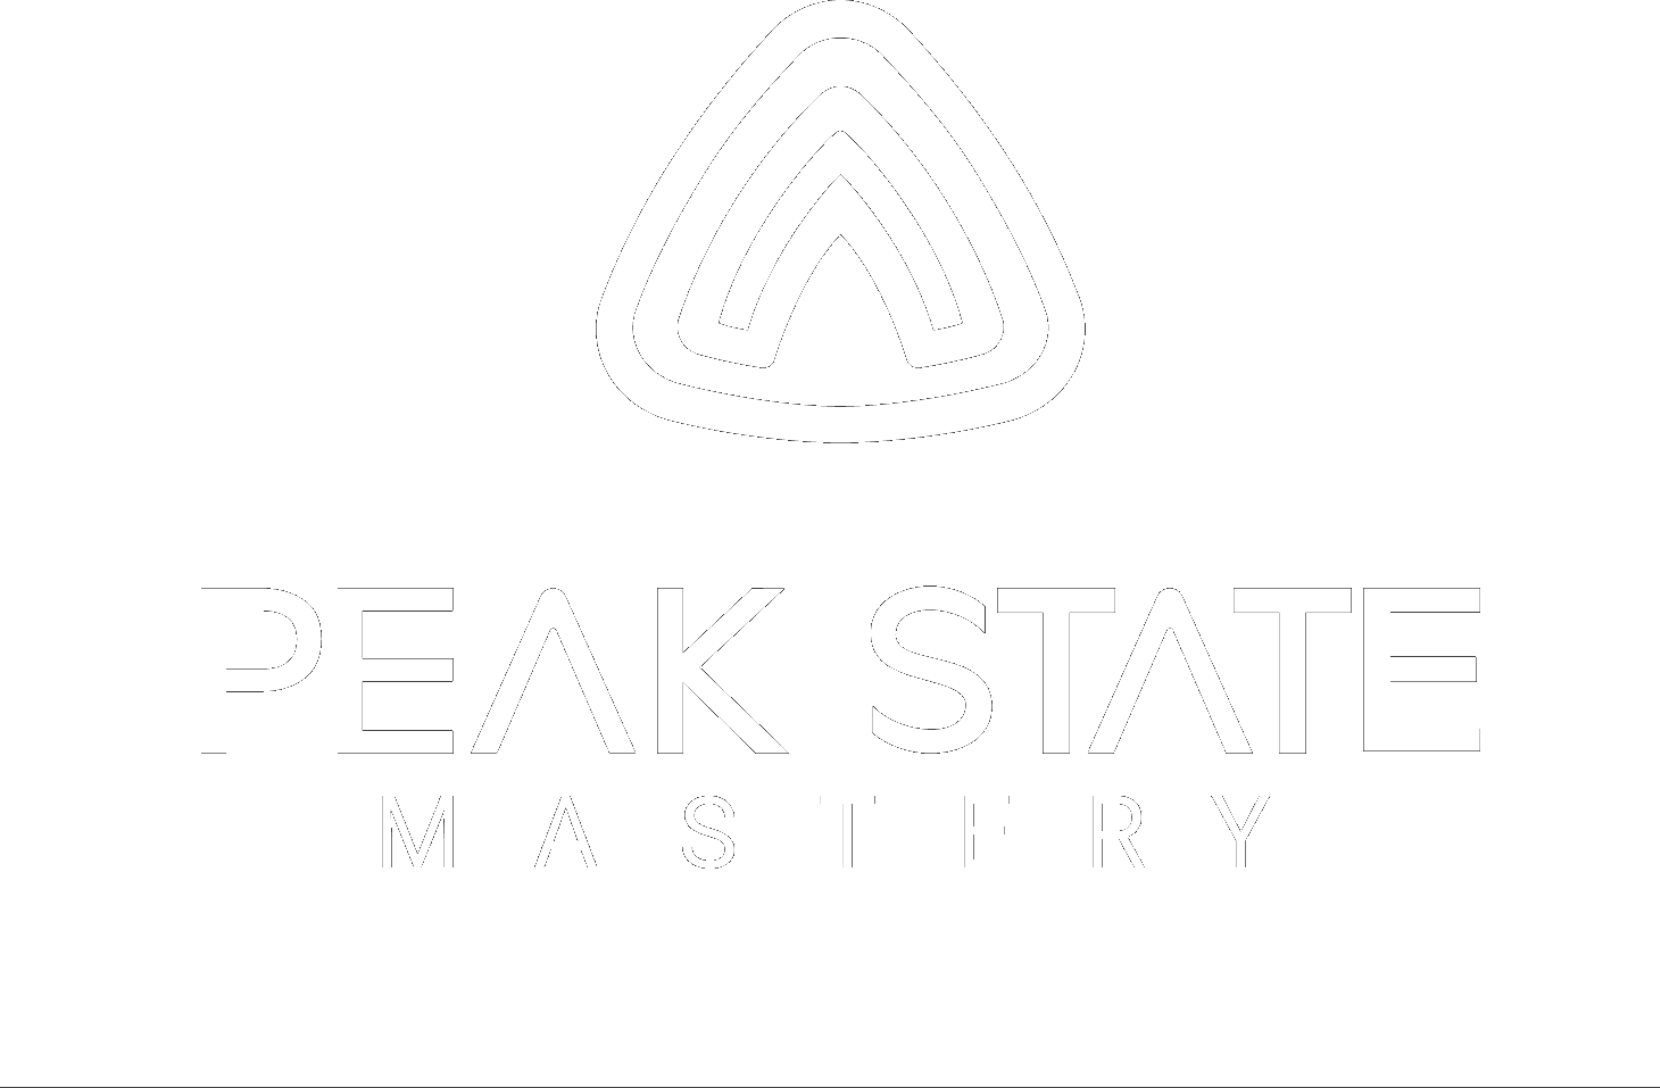 Peak State Mastery